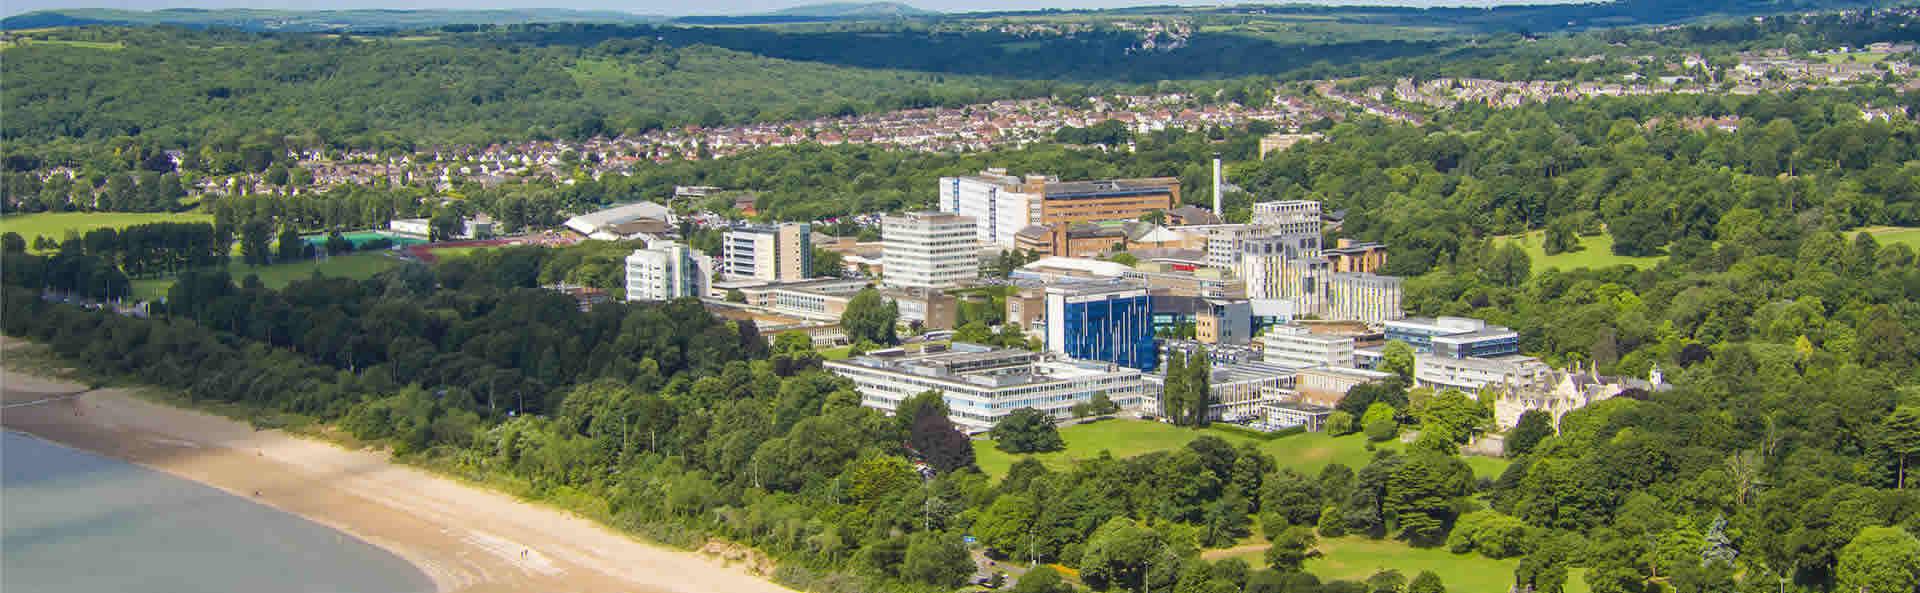 Swansea University Medical School